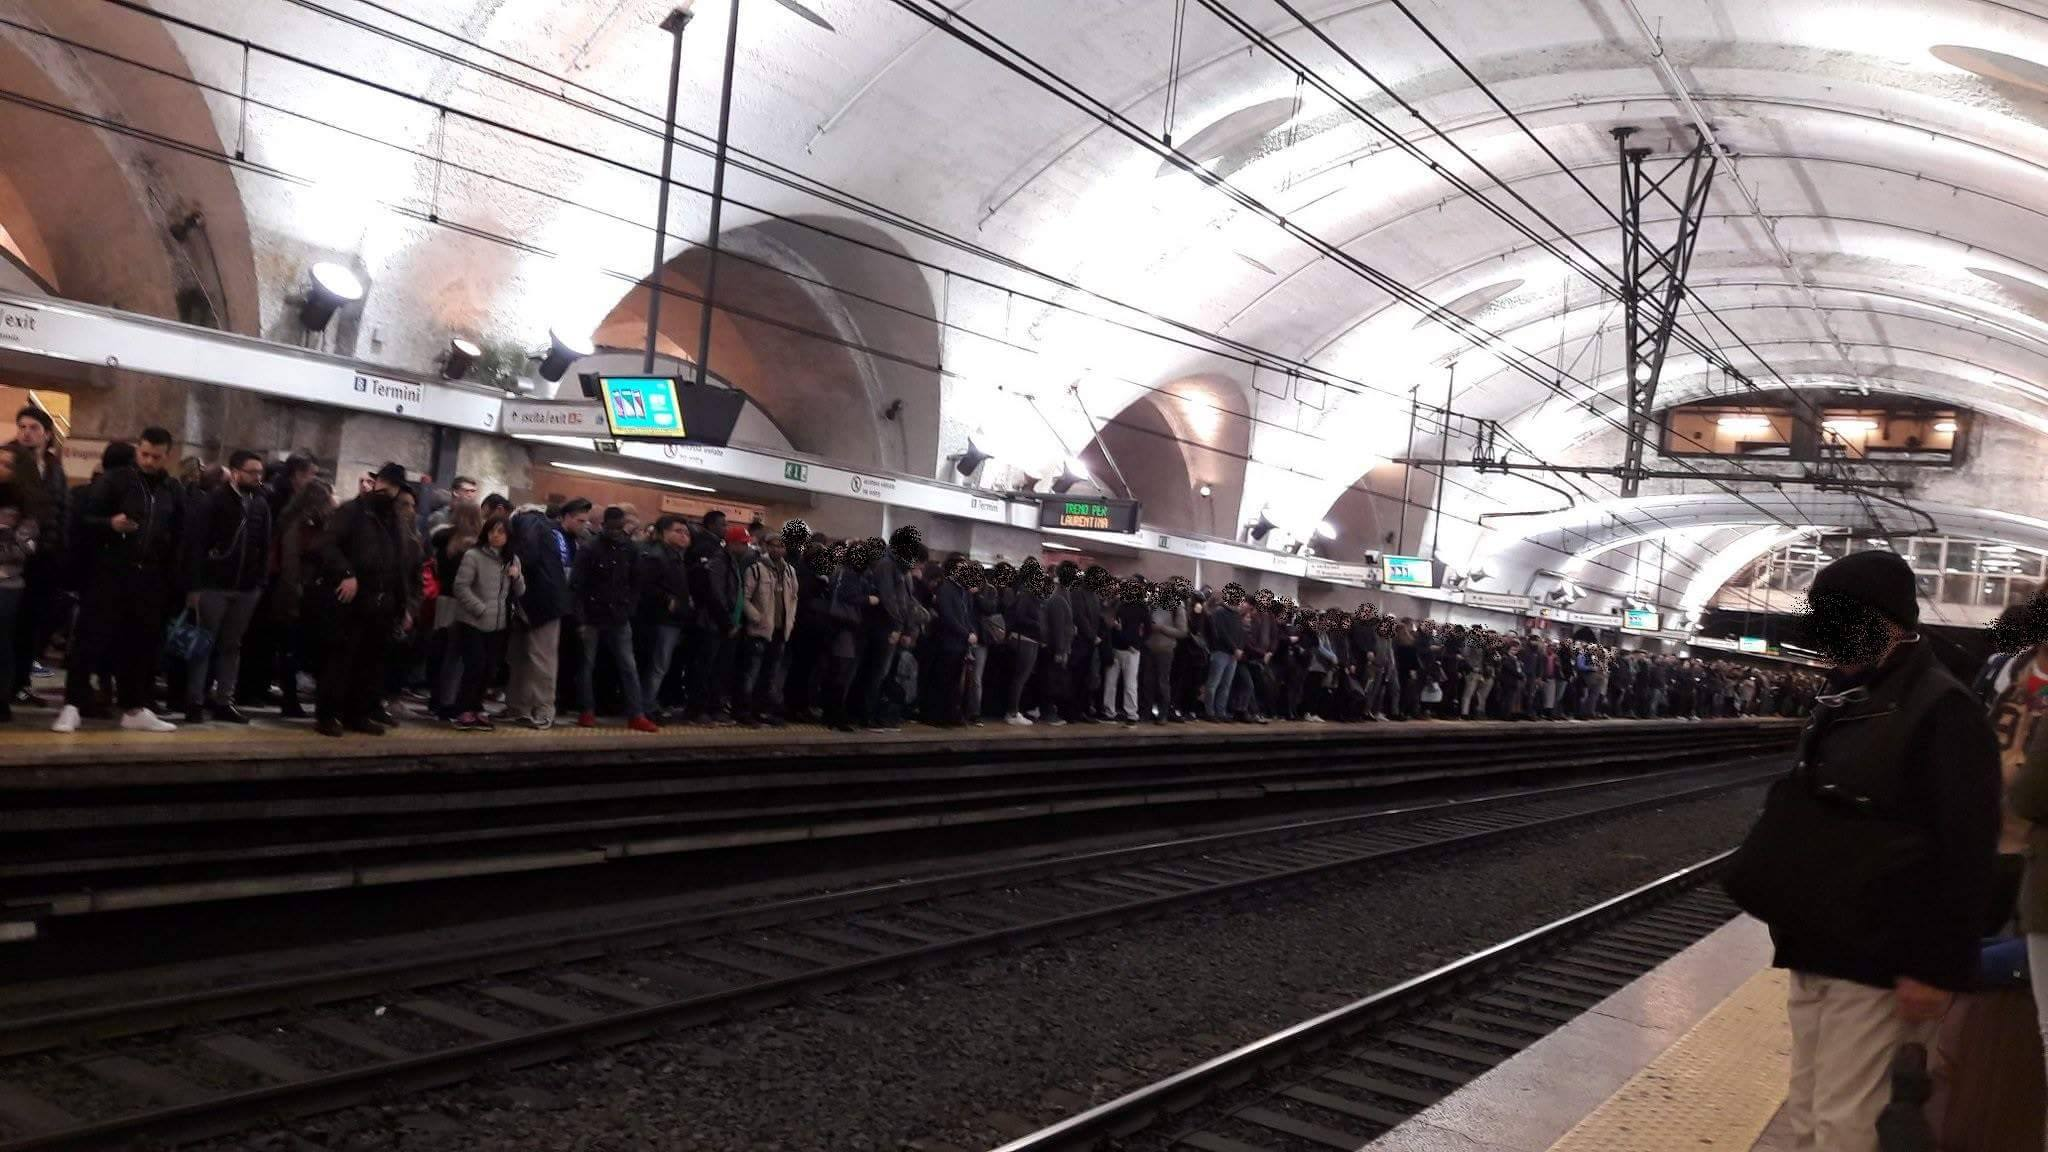 atac metro roma sciopero bianco enrico stefàno - 9